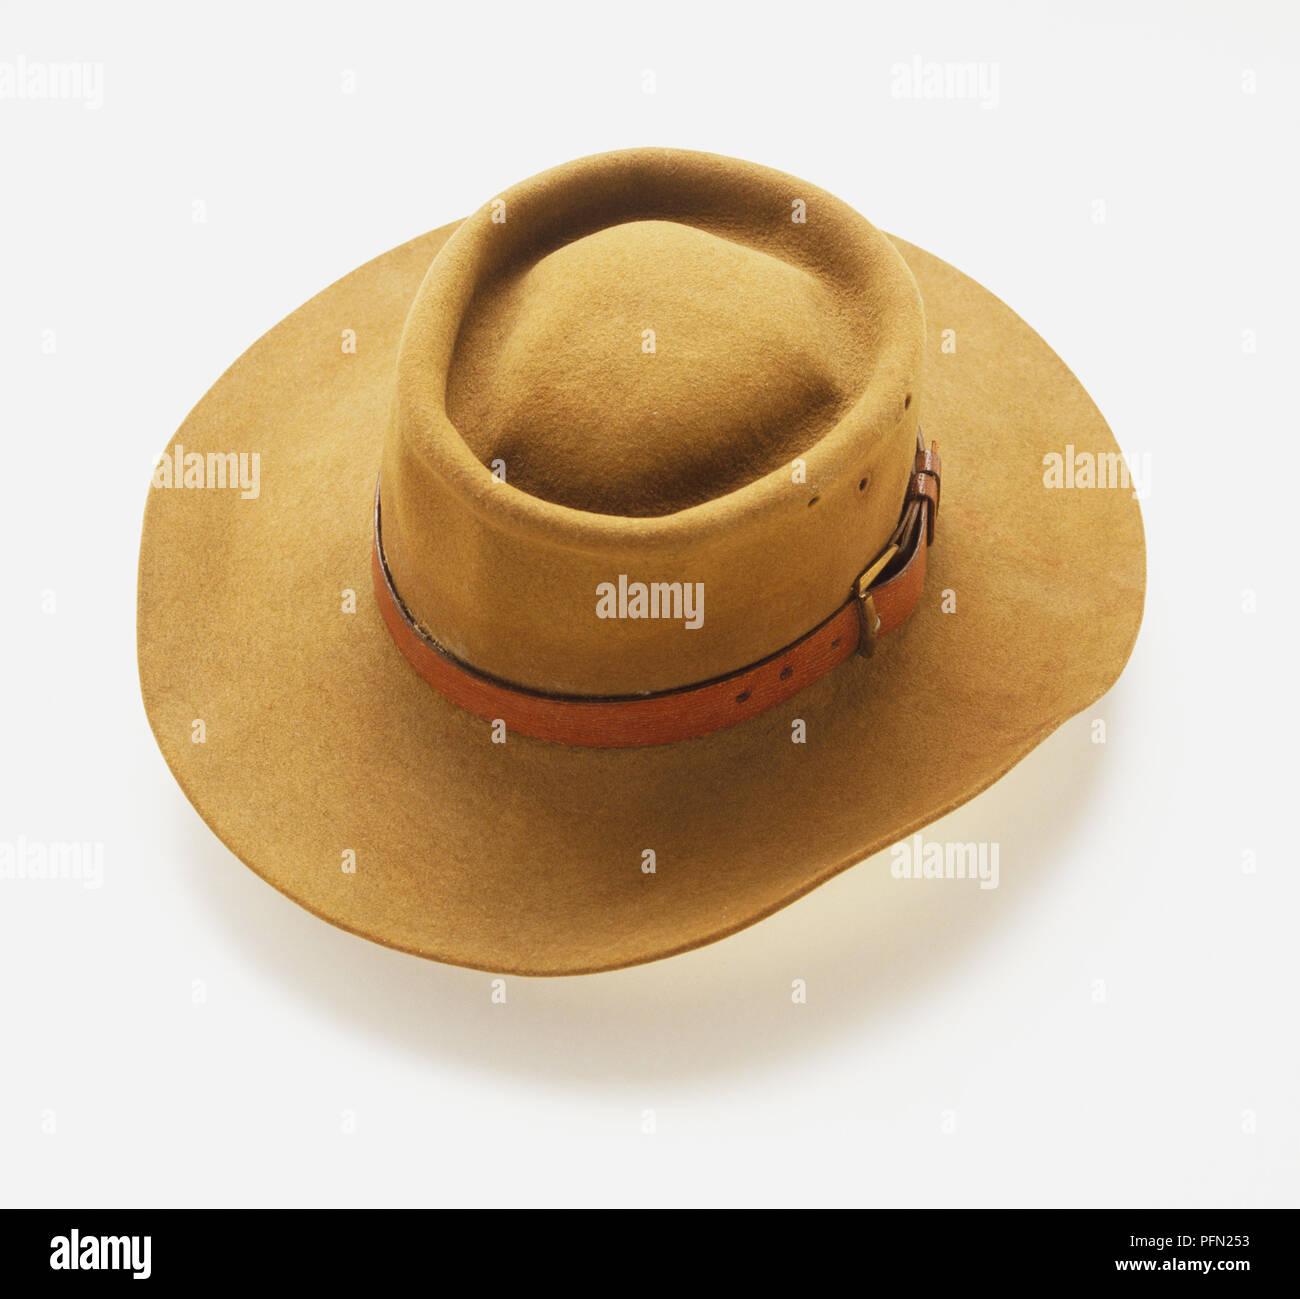 618c592e21 Australian Hat Stock Photos & Australian Hat Stock Images - Alamy